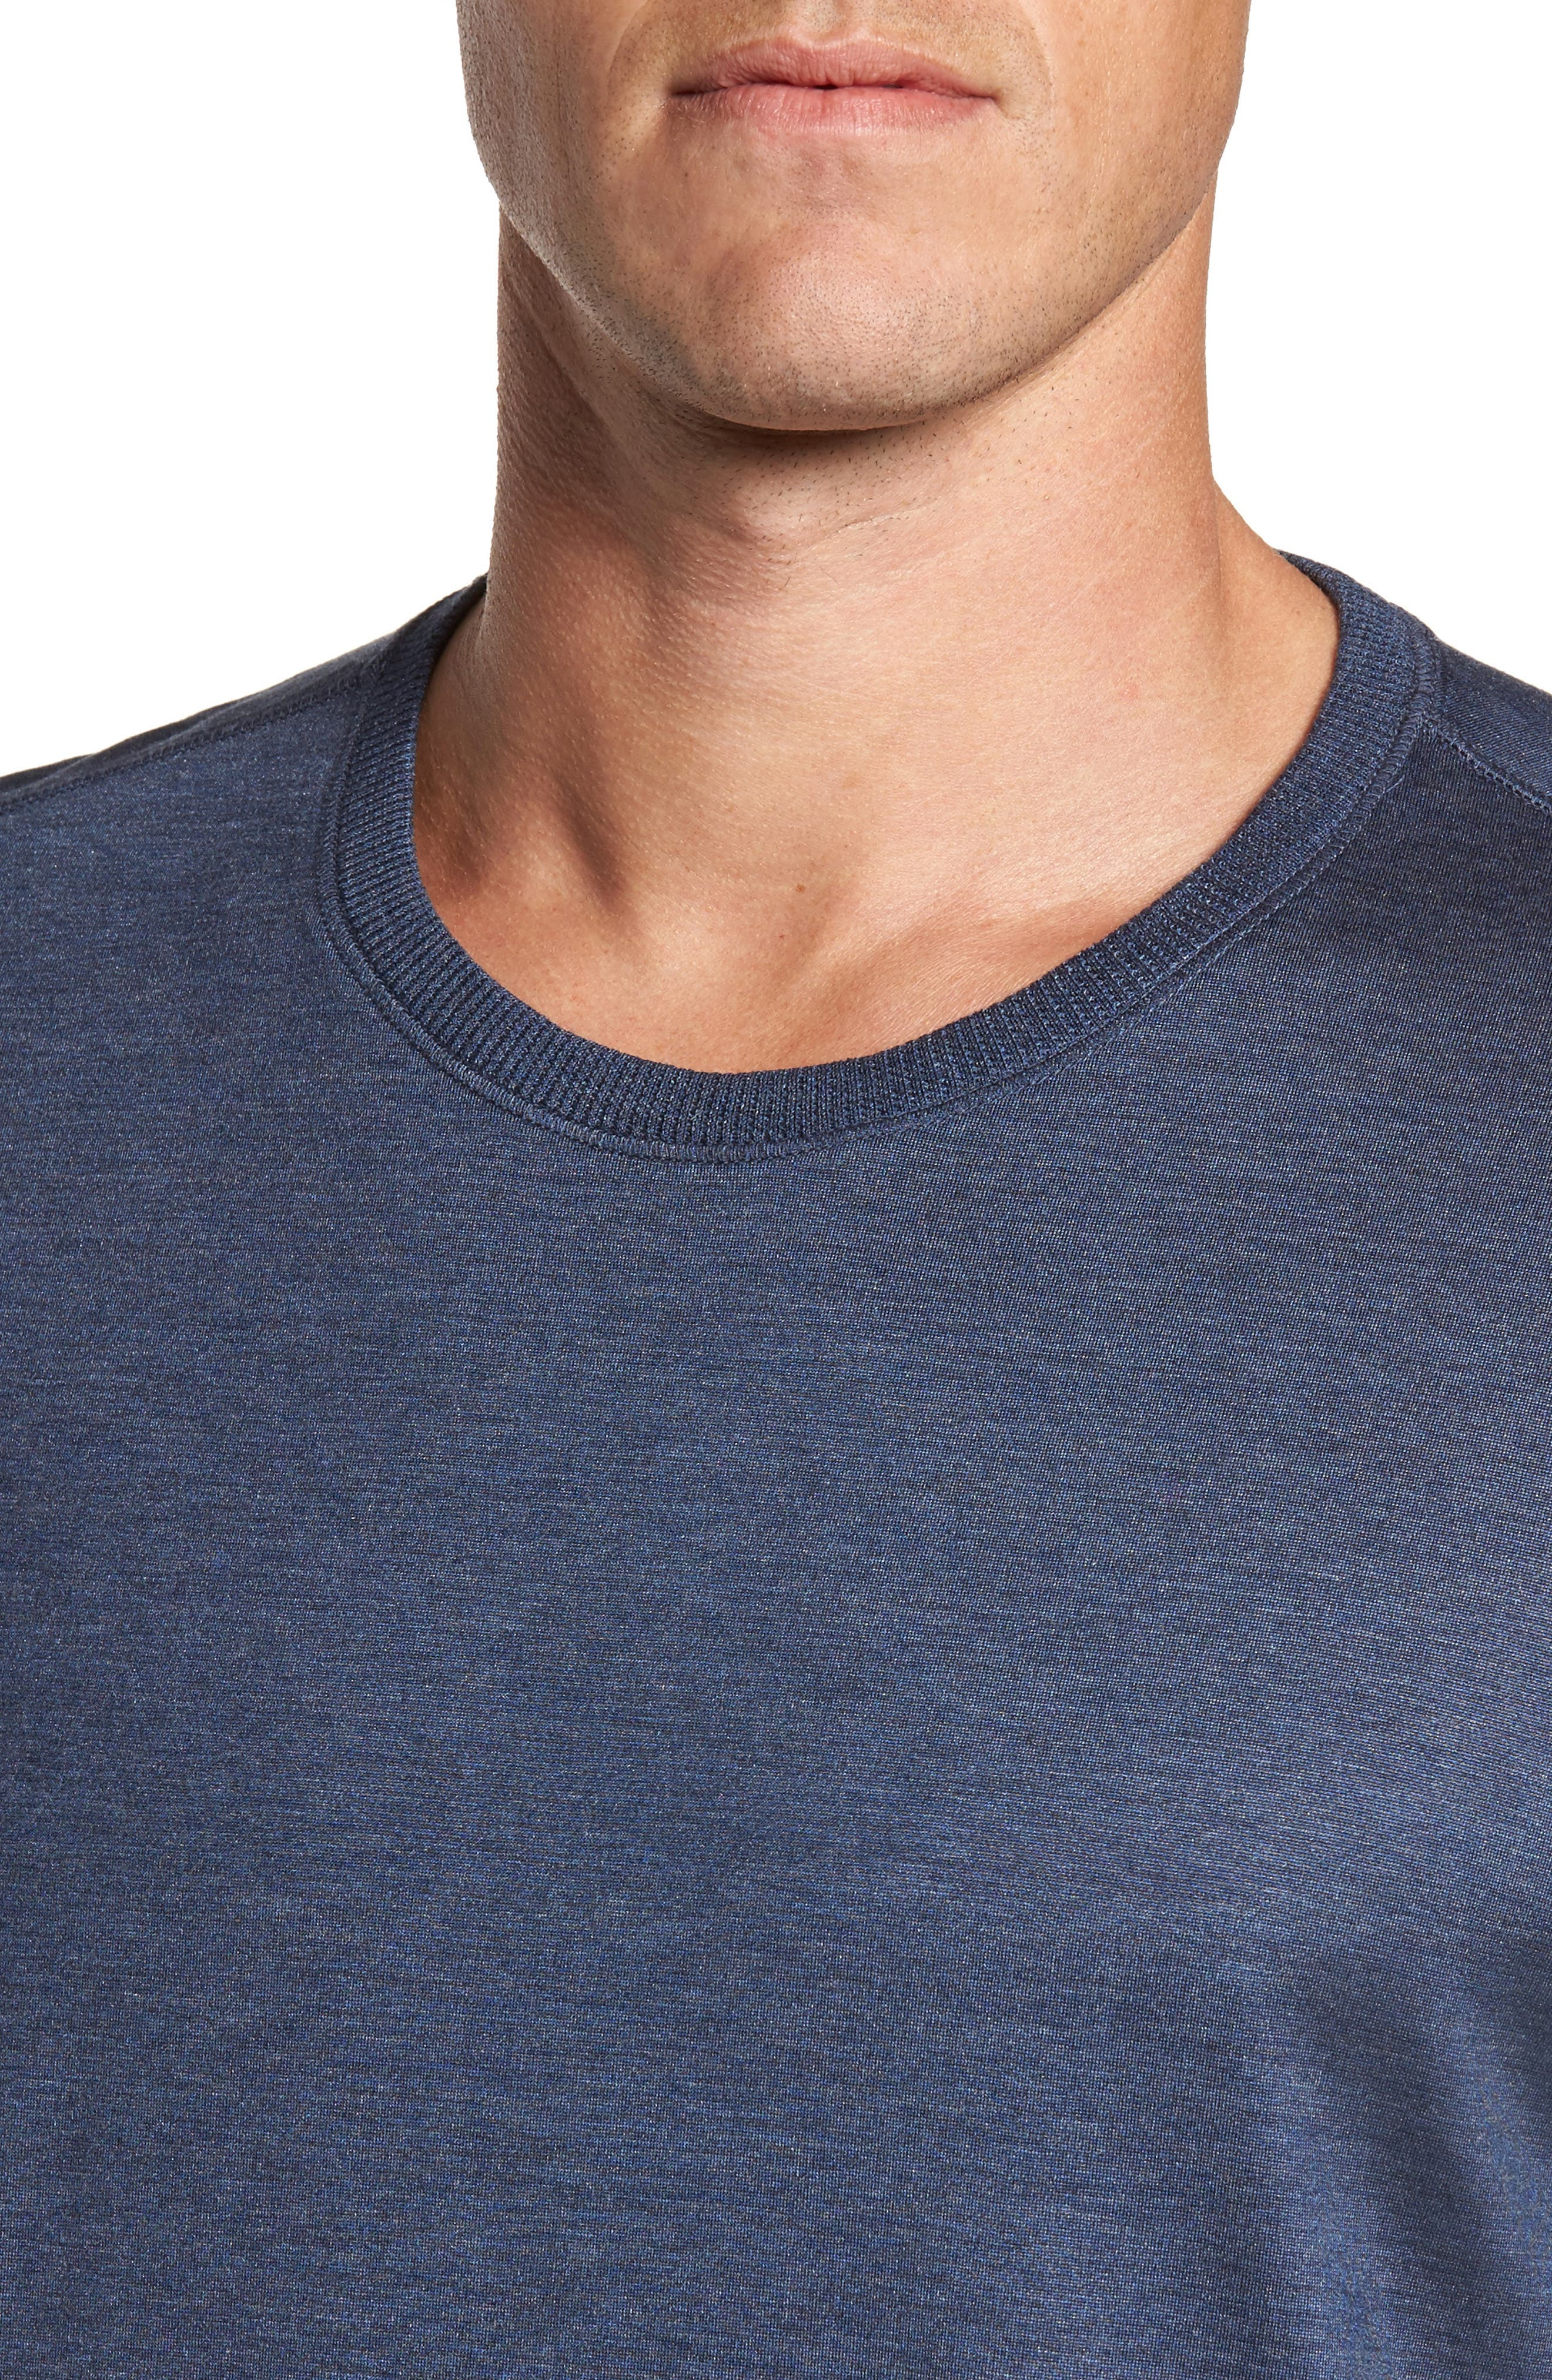 Silk & Cotton Crewneck T-Shirt,                             Alternate thumbnail 4, color,                             NAVY HEATHER